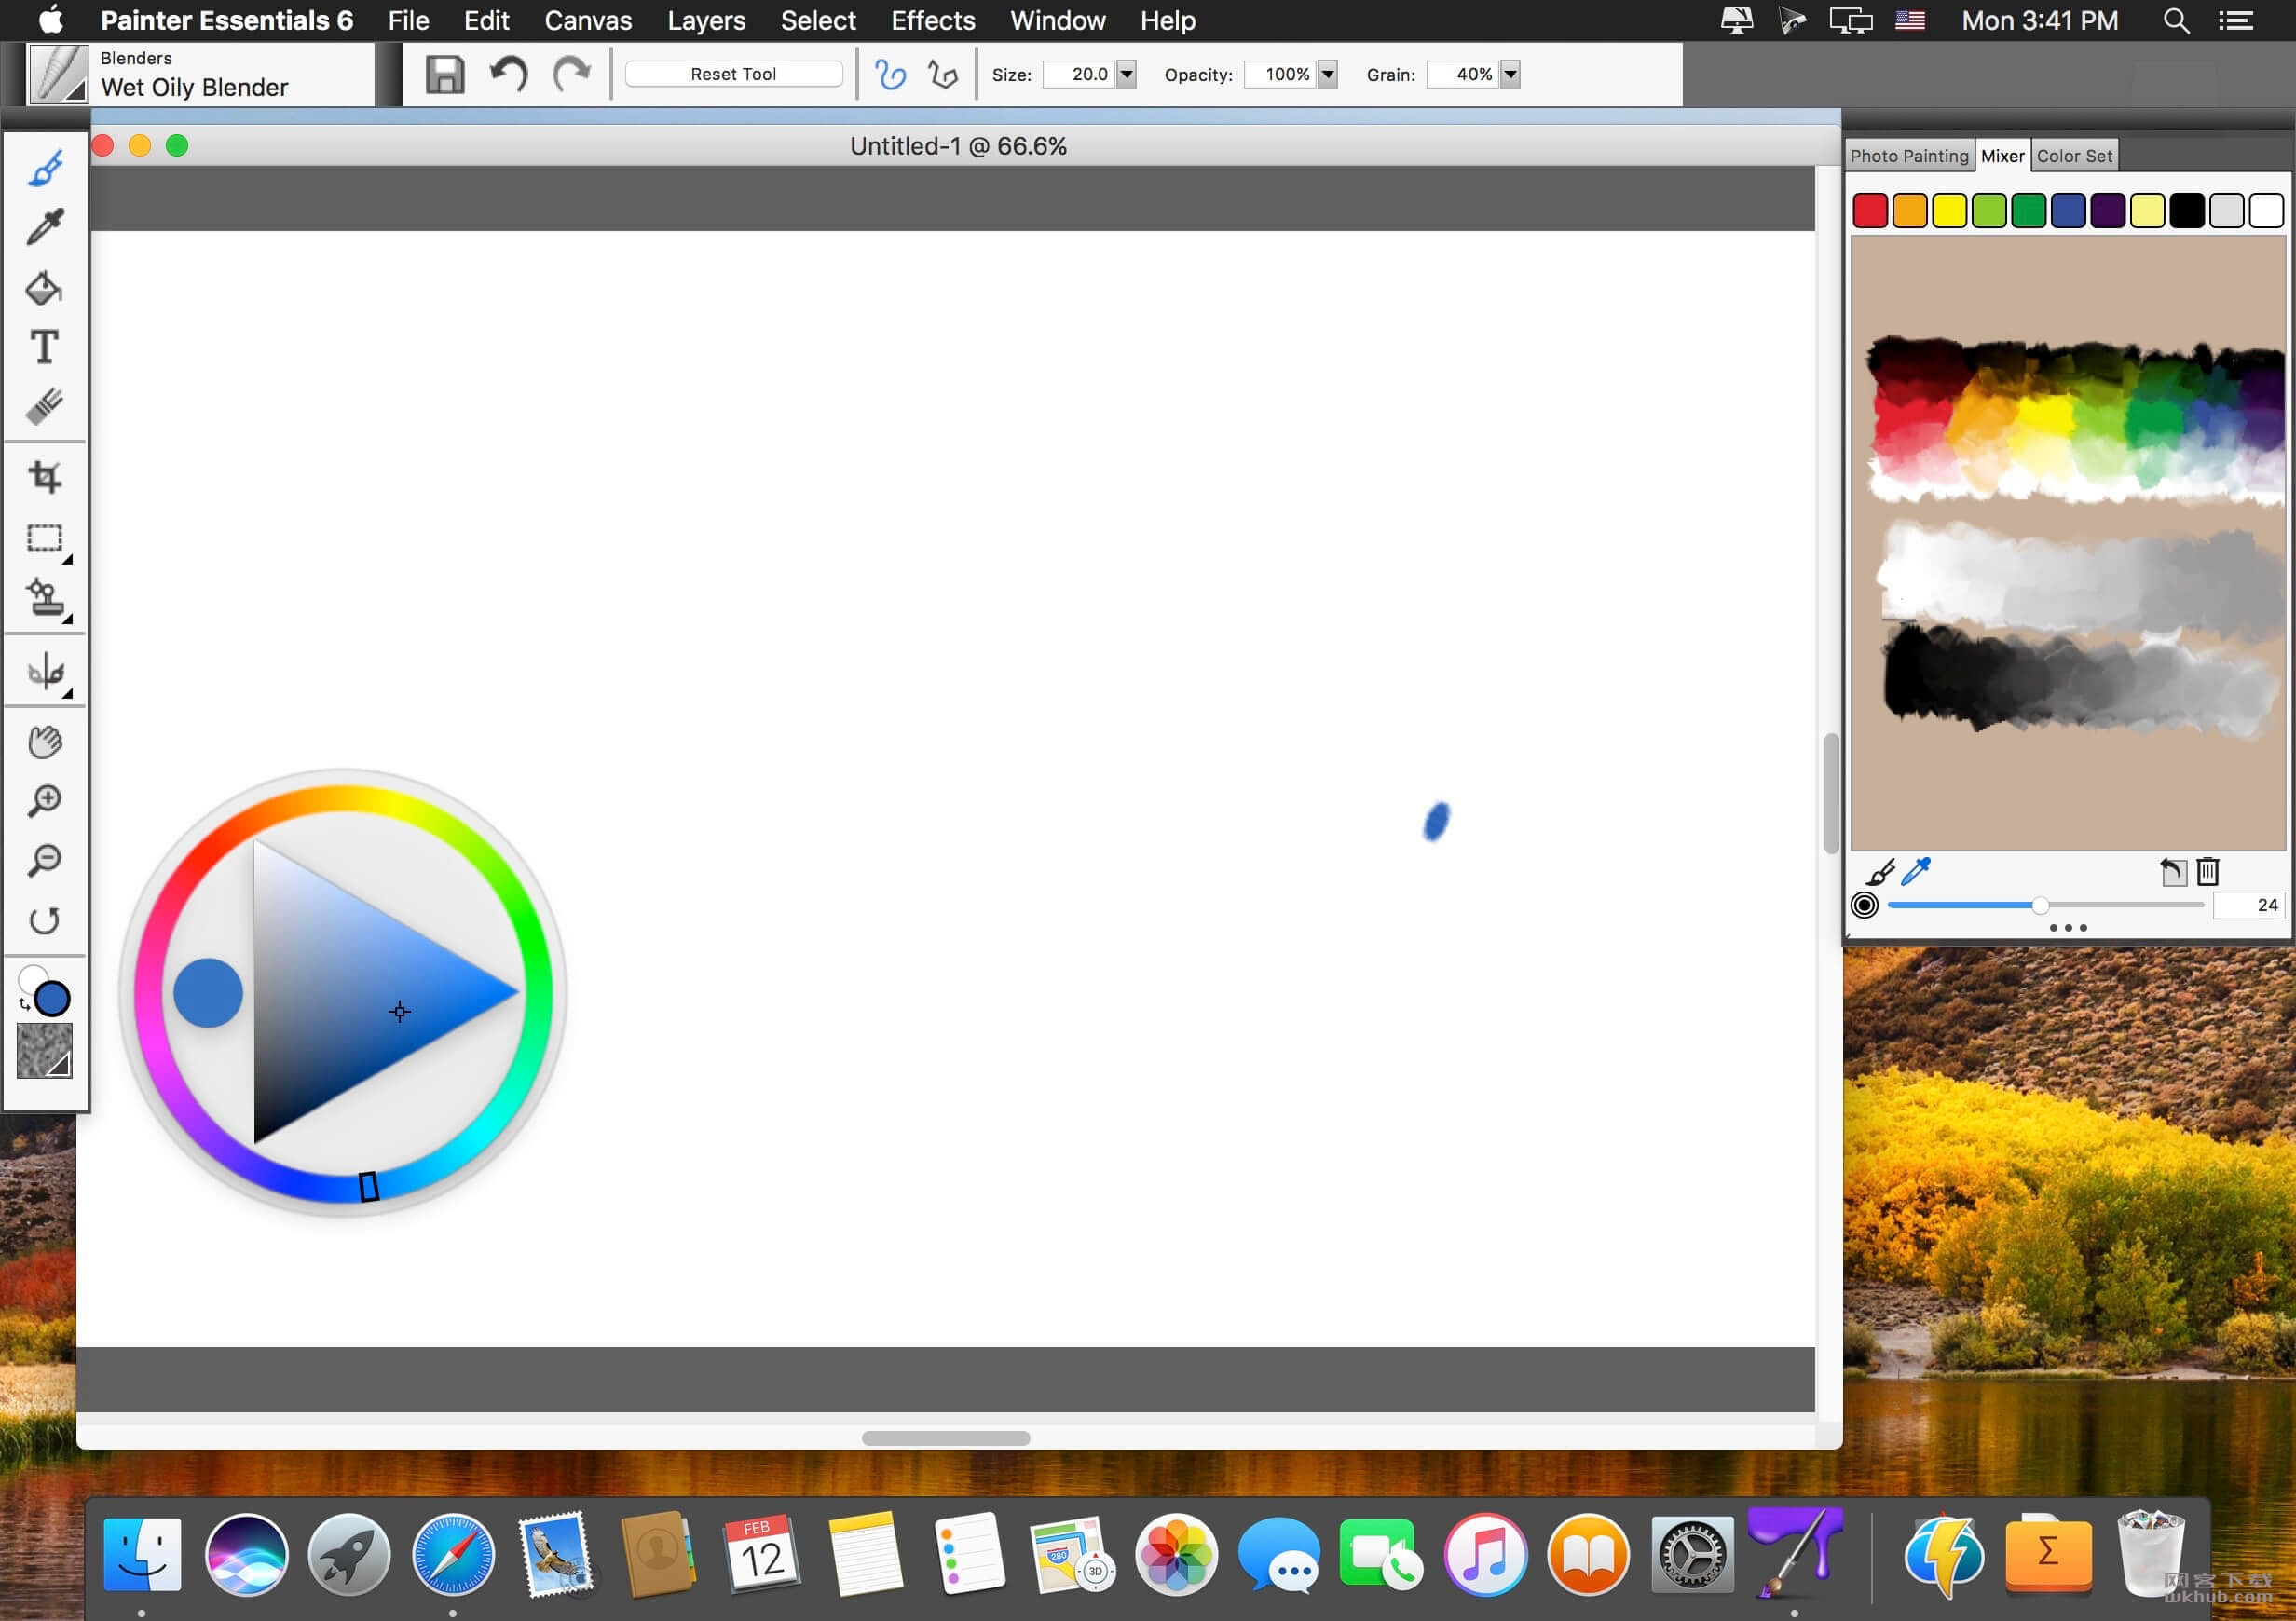 Corel Painter Essentials 6.1.0.238 强大优秀的素描绘图软件